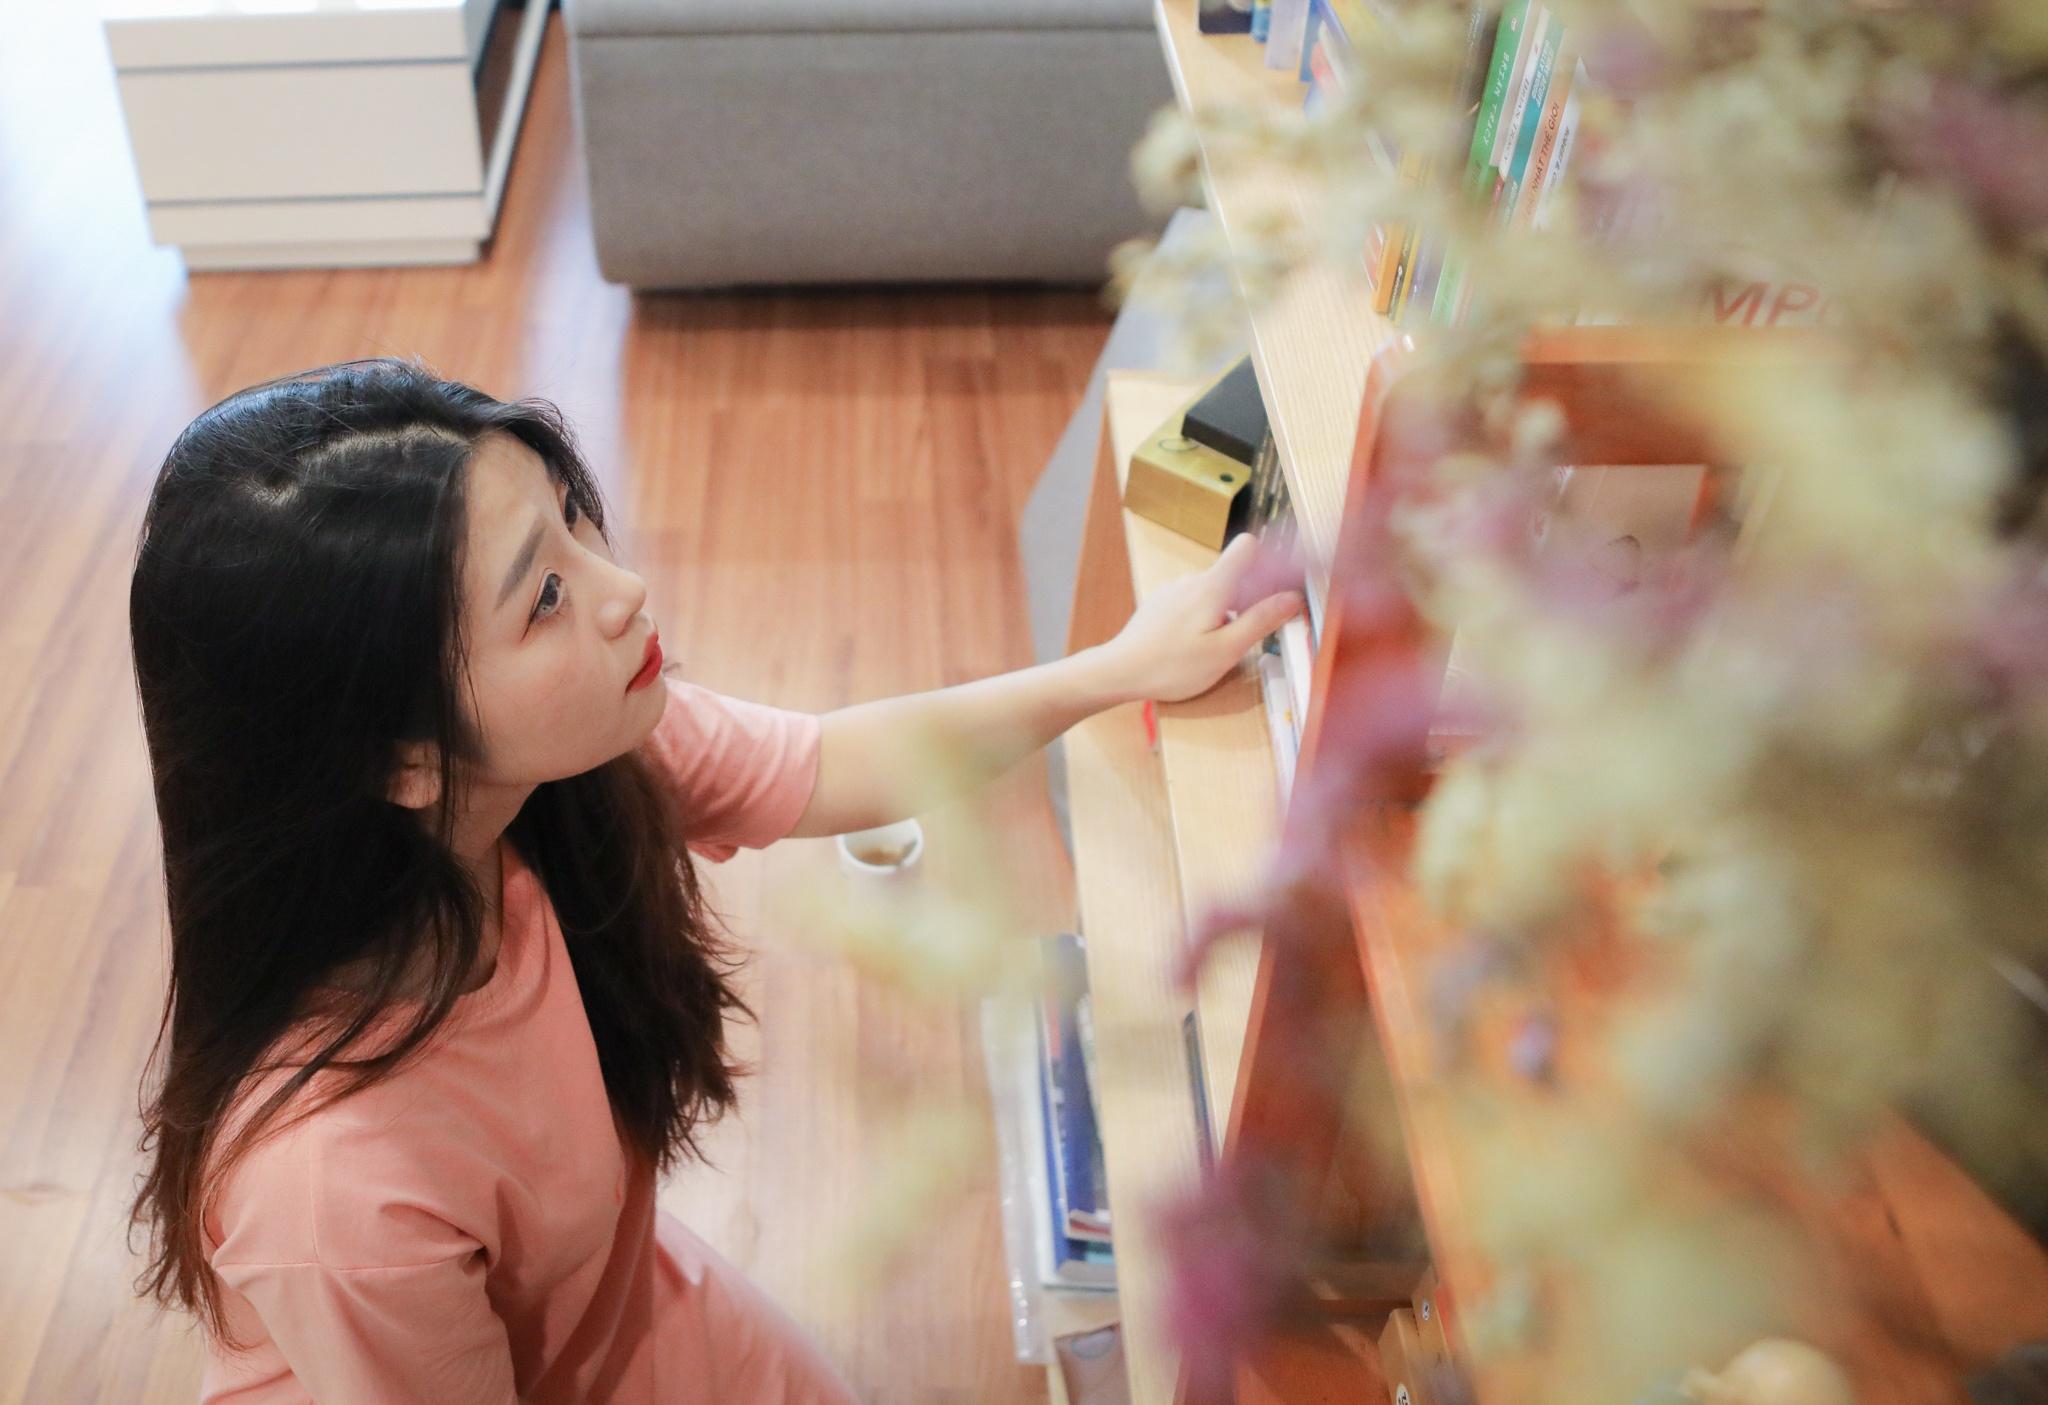 Hot girl mua con so khong ai yeu vi qua manh me hinh anh 28 30_hot_girl_mua_con_zing21.jpg